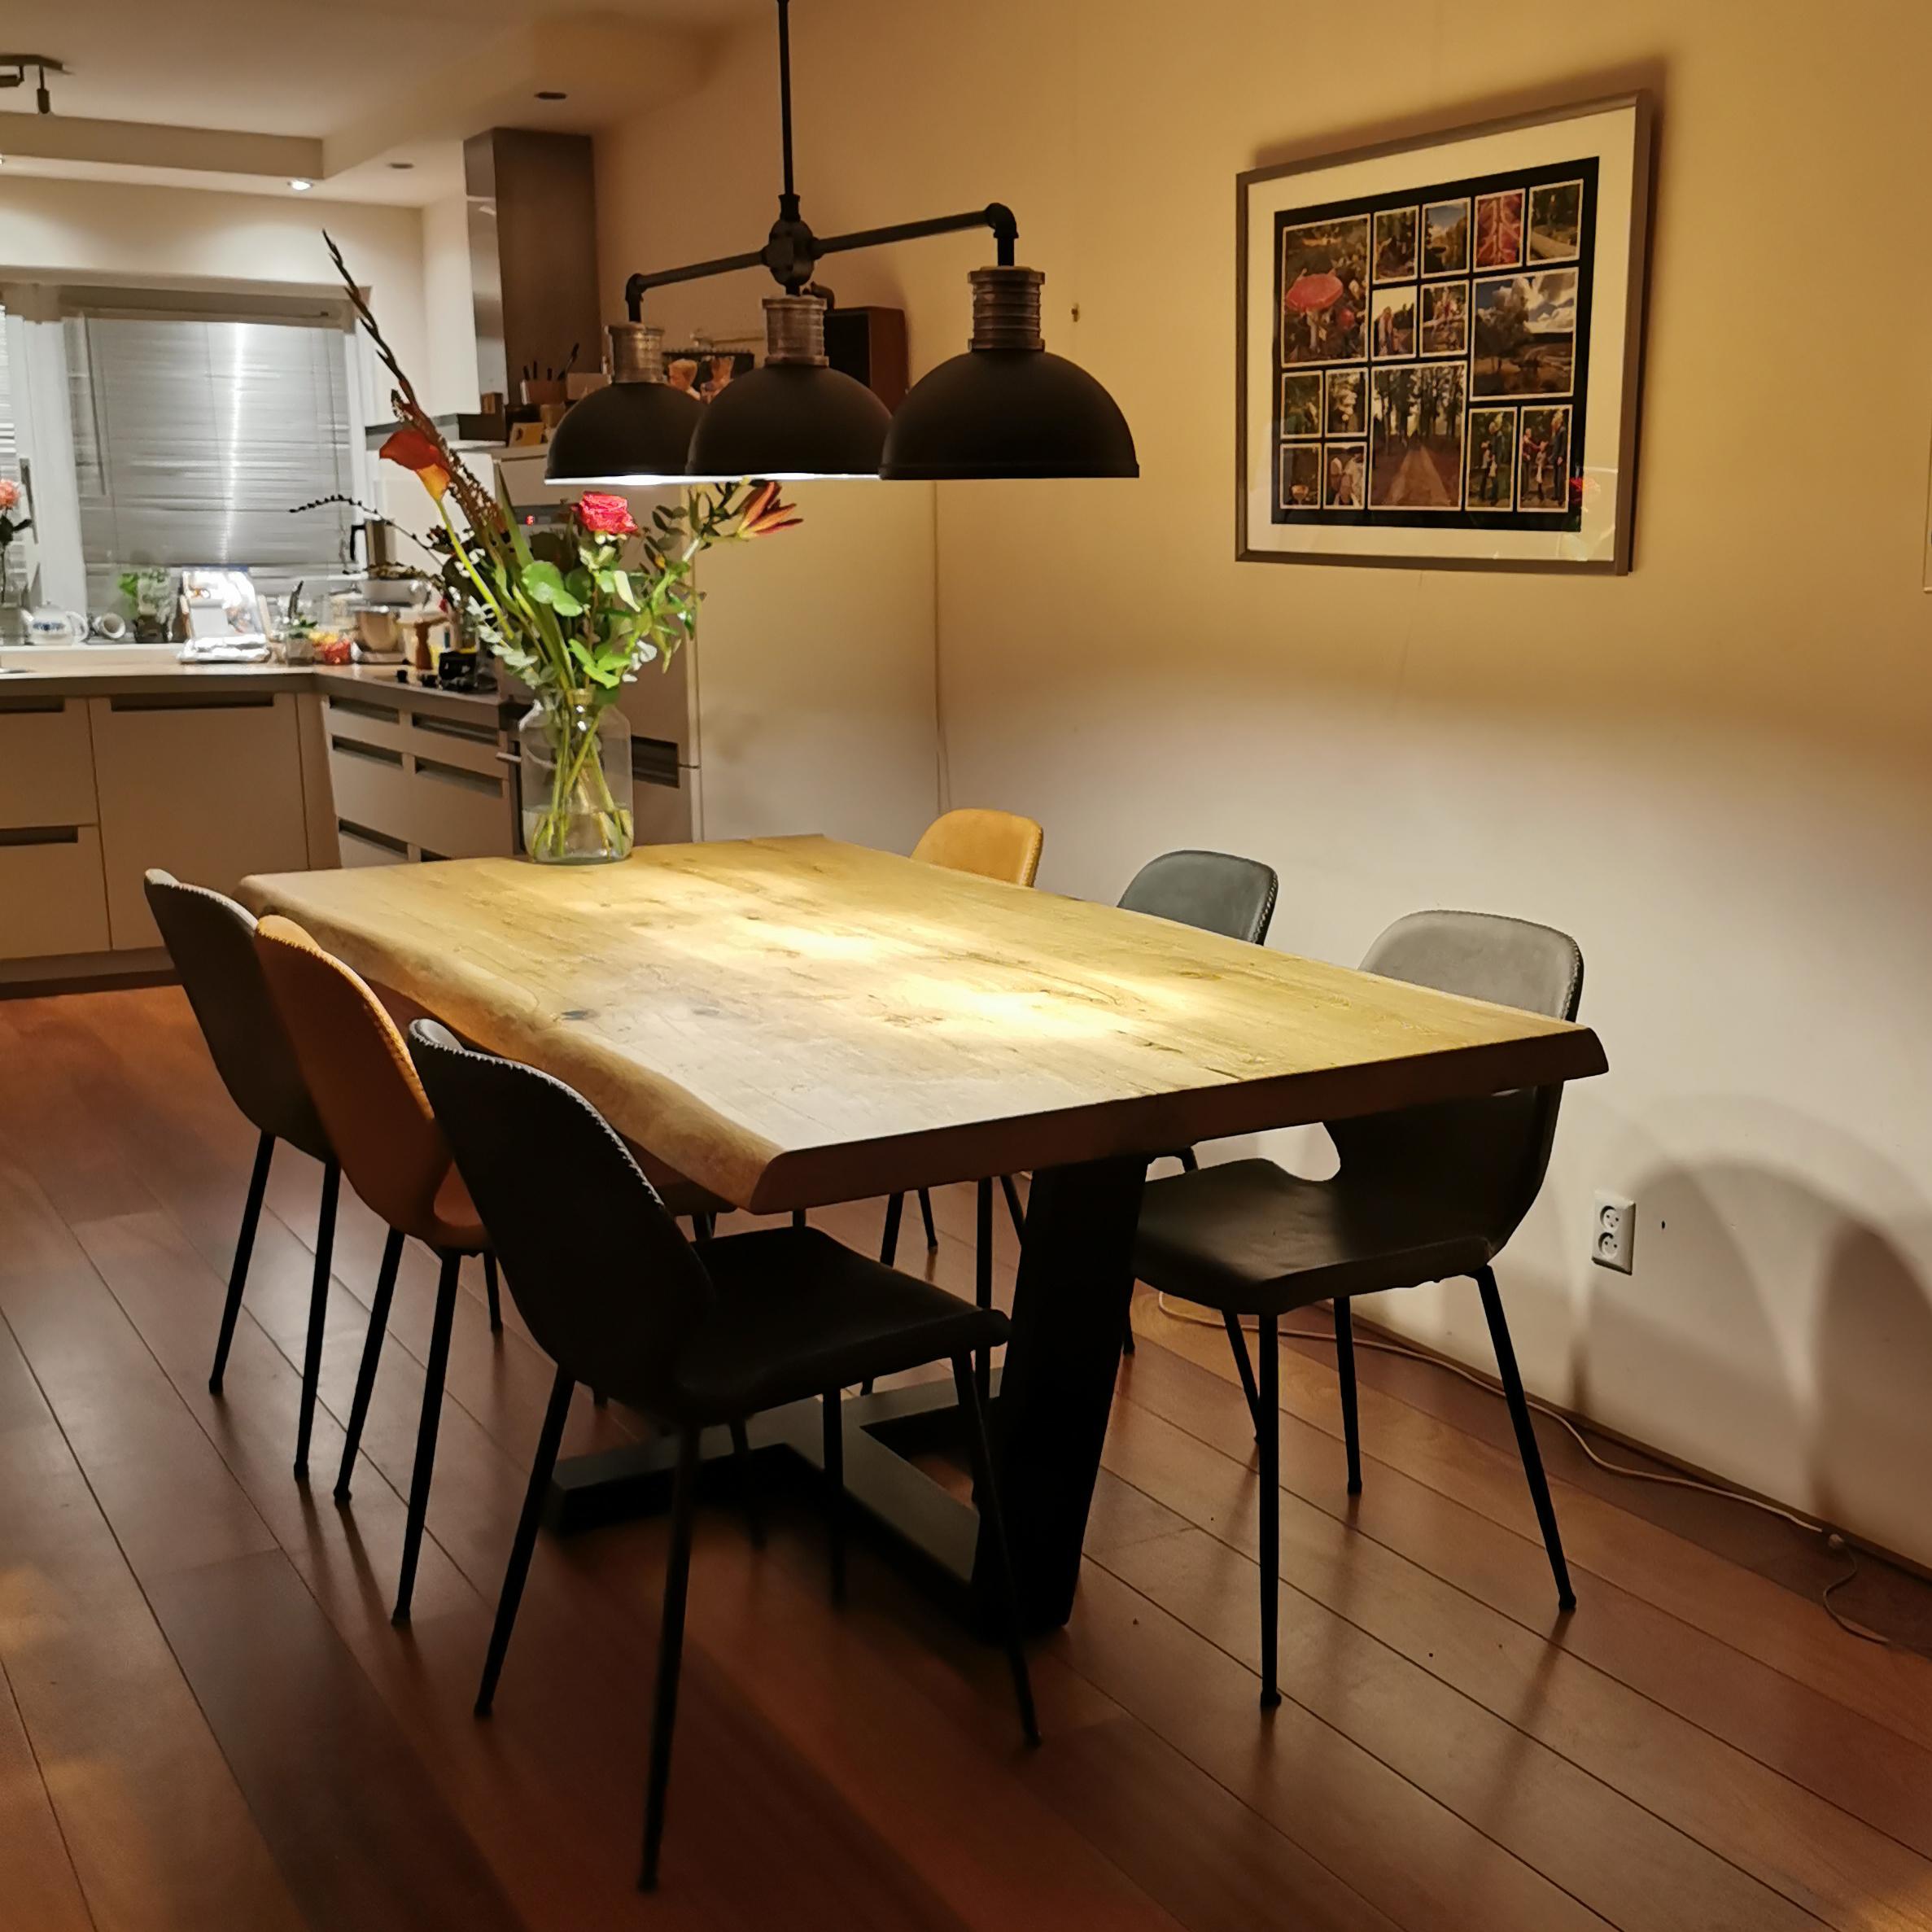 Industrial Hanging Lamp Black 3 Lights, Industrial Dining Room Lighting